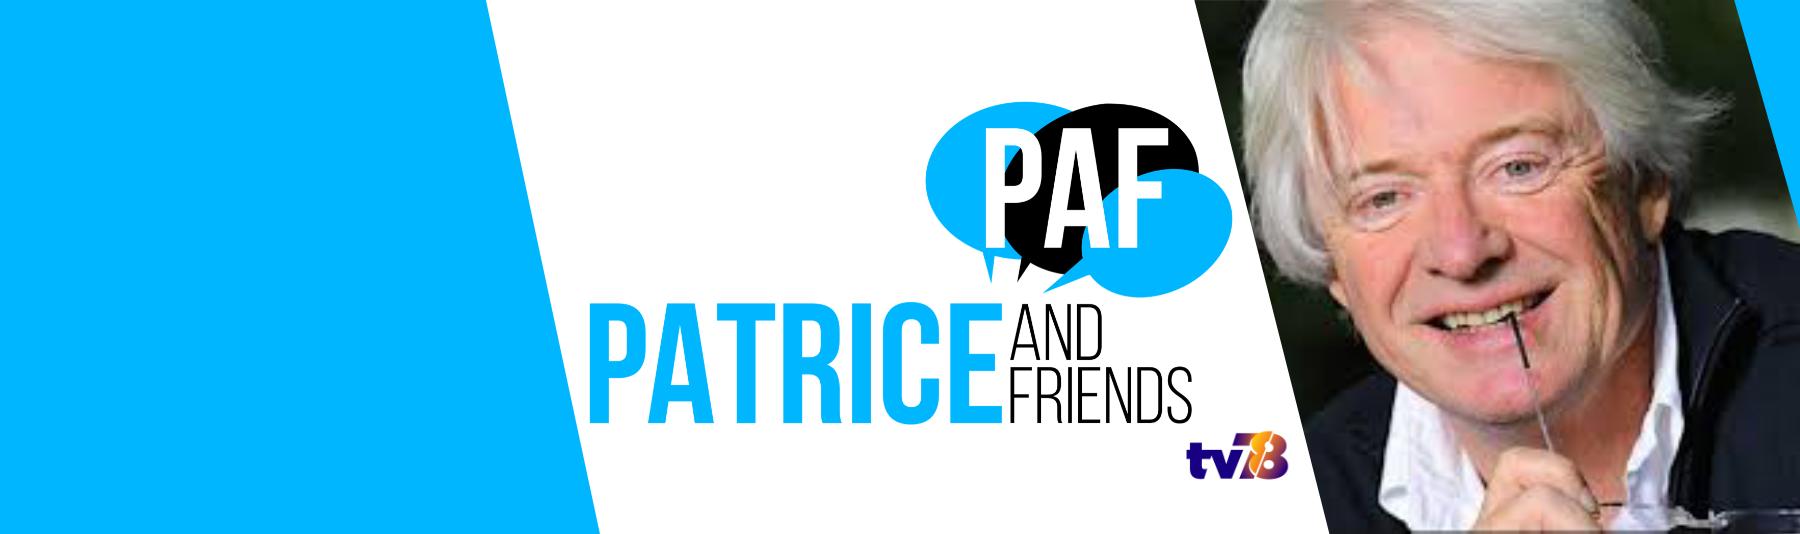 PAF - Patrice Carmouze and friends